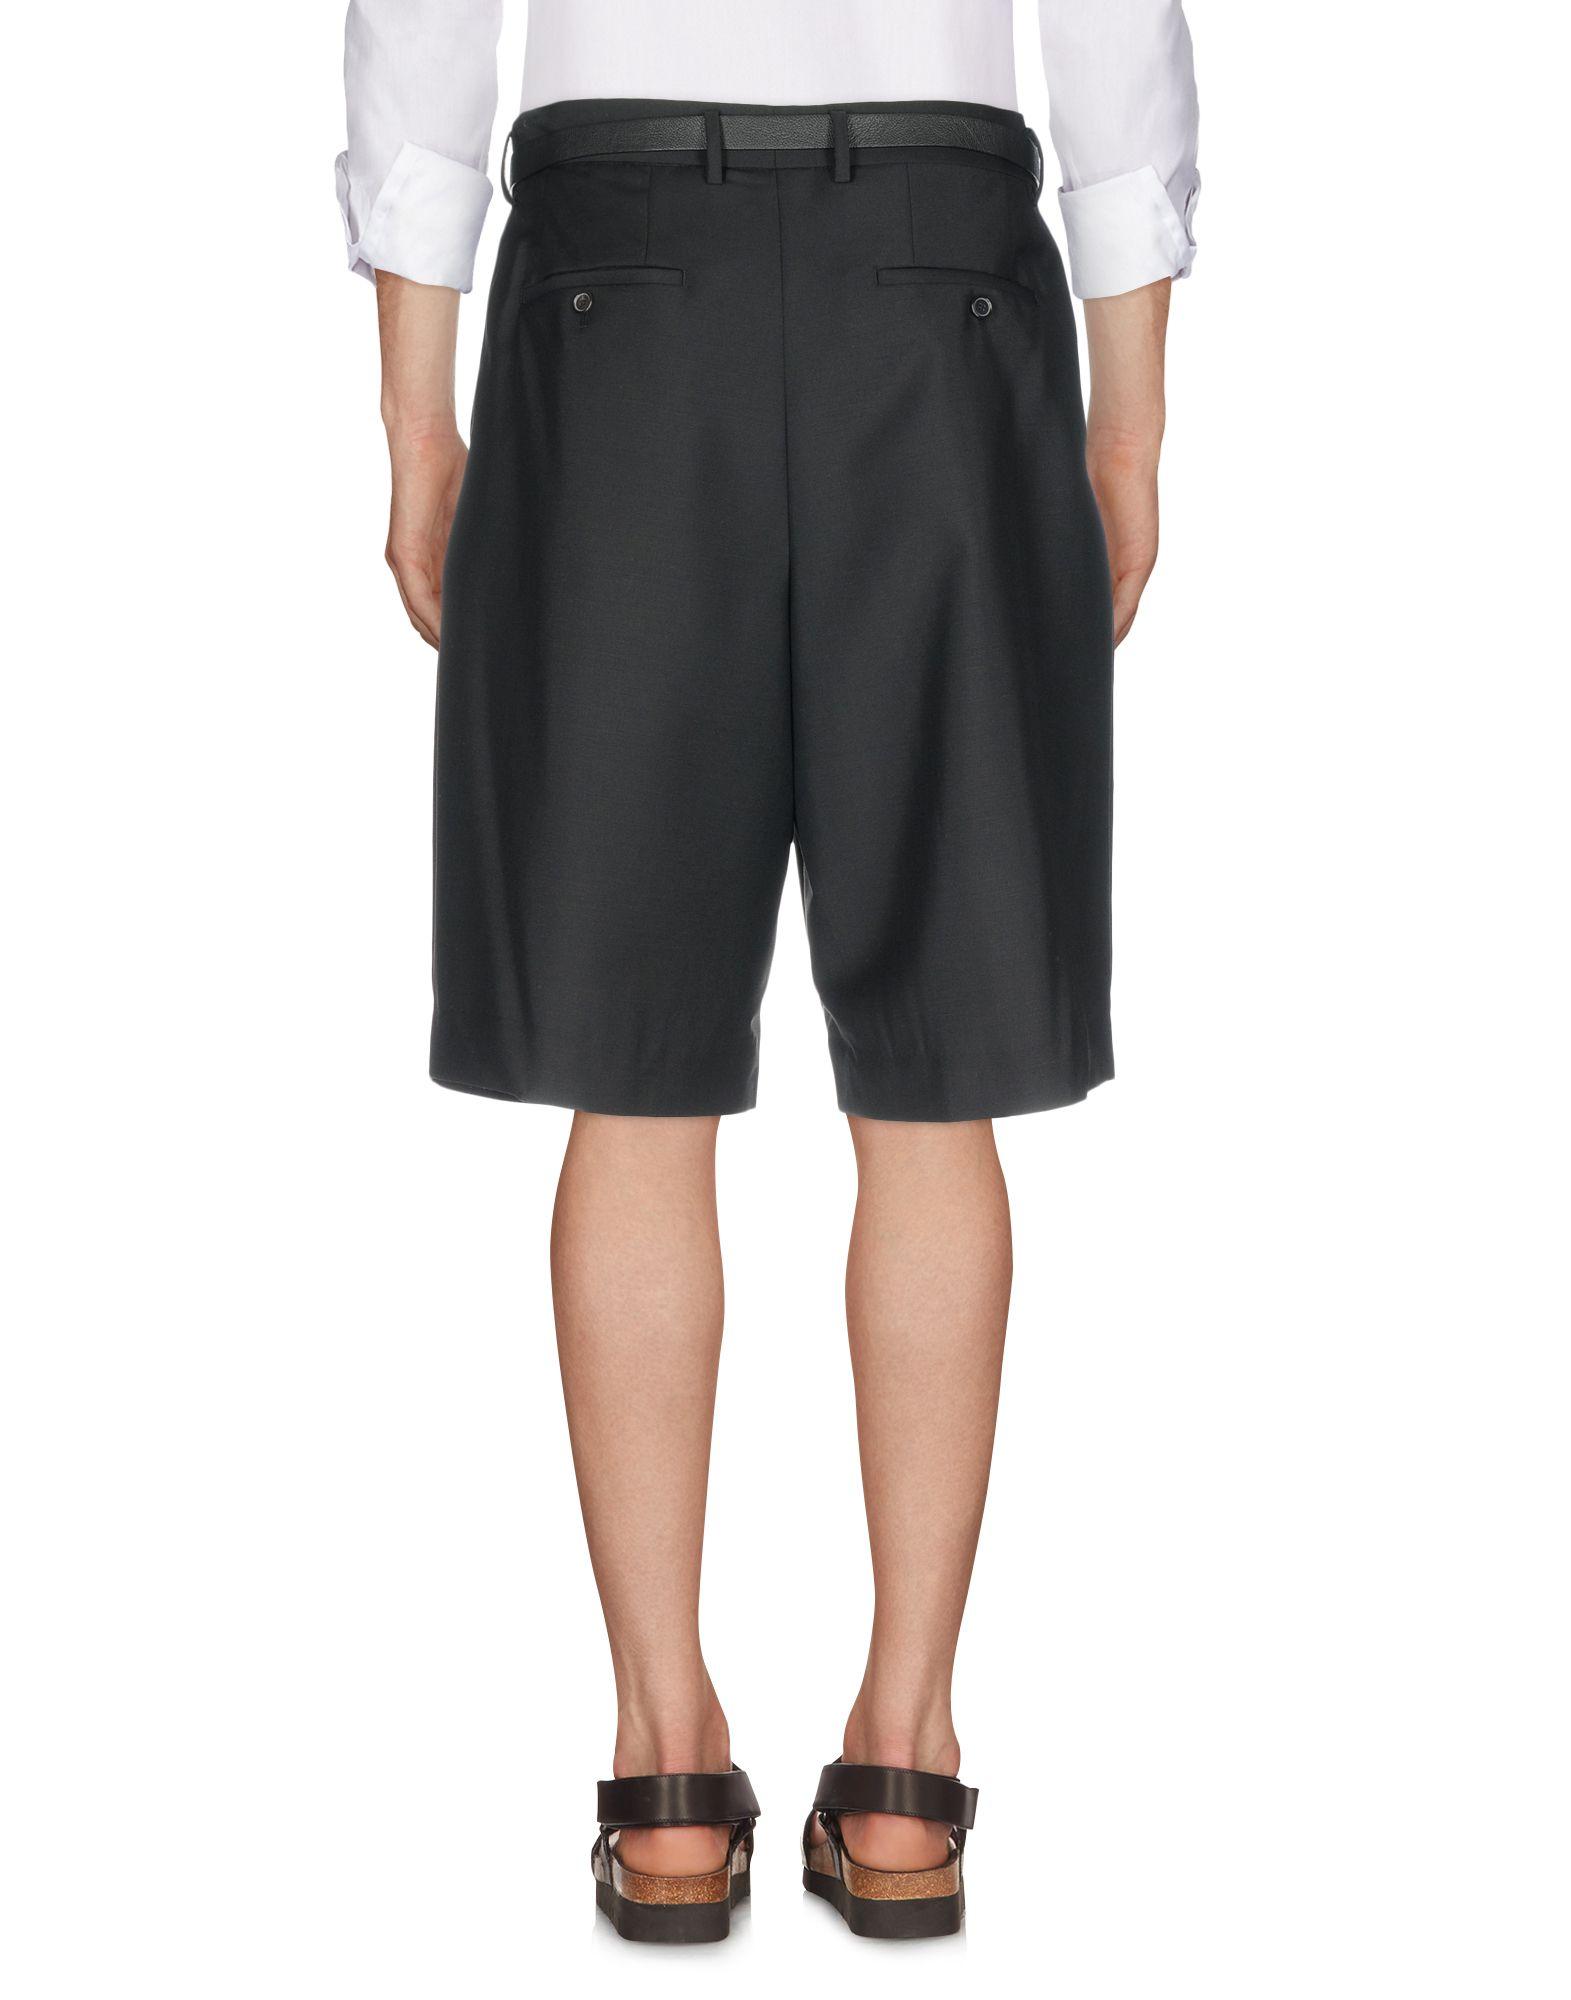 Pantalone Classico Solid Homme 13144176KJ Uomo - 13144176KJ Homme 9002c6